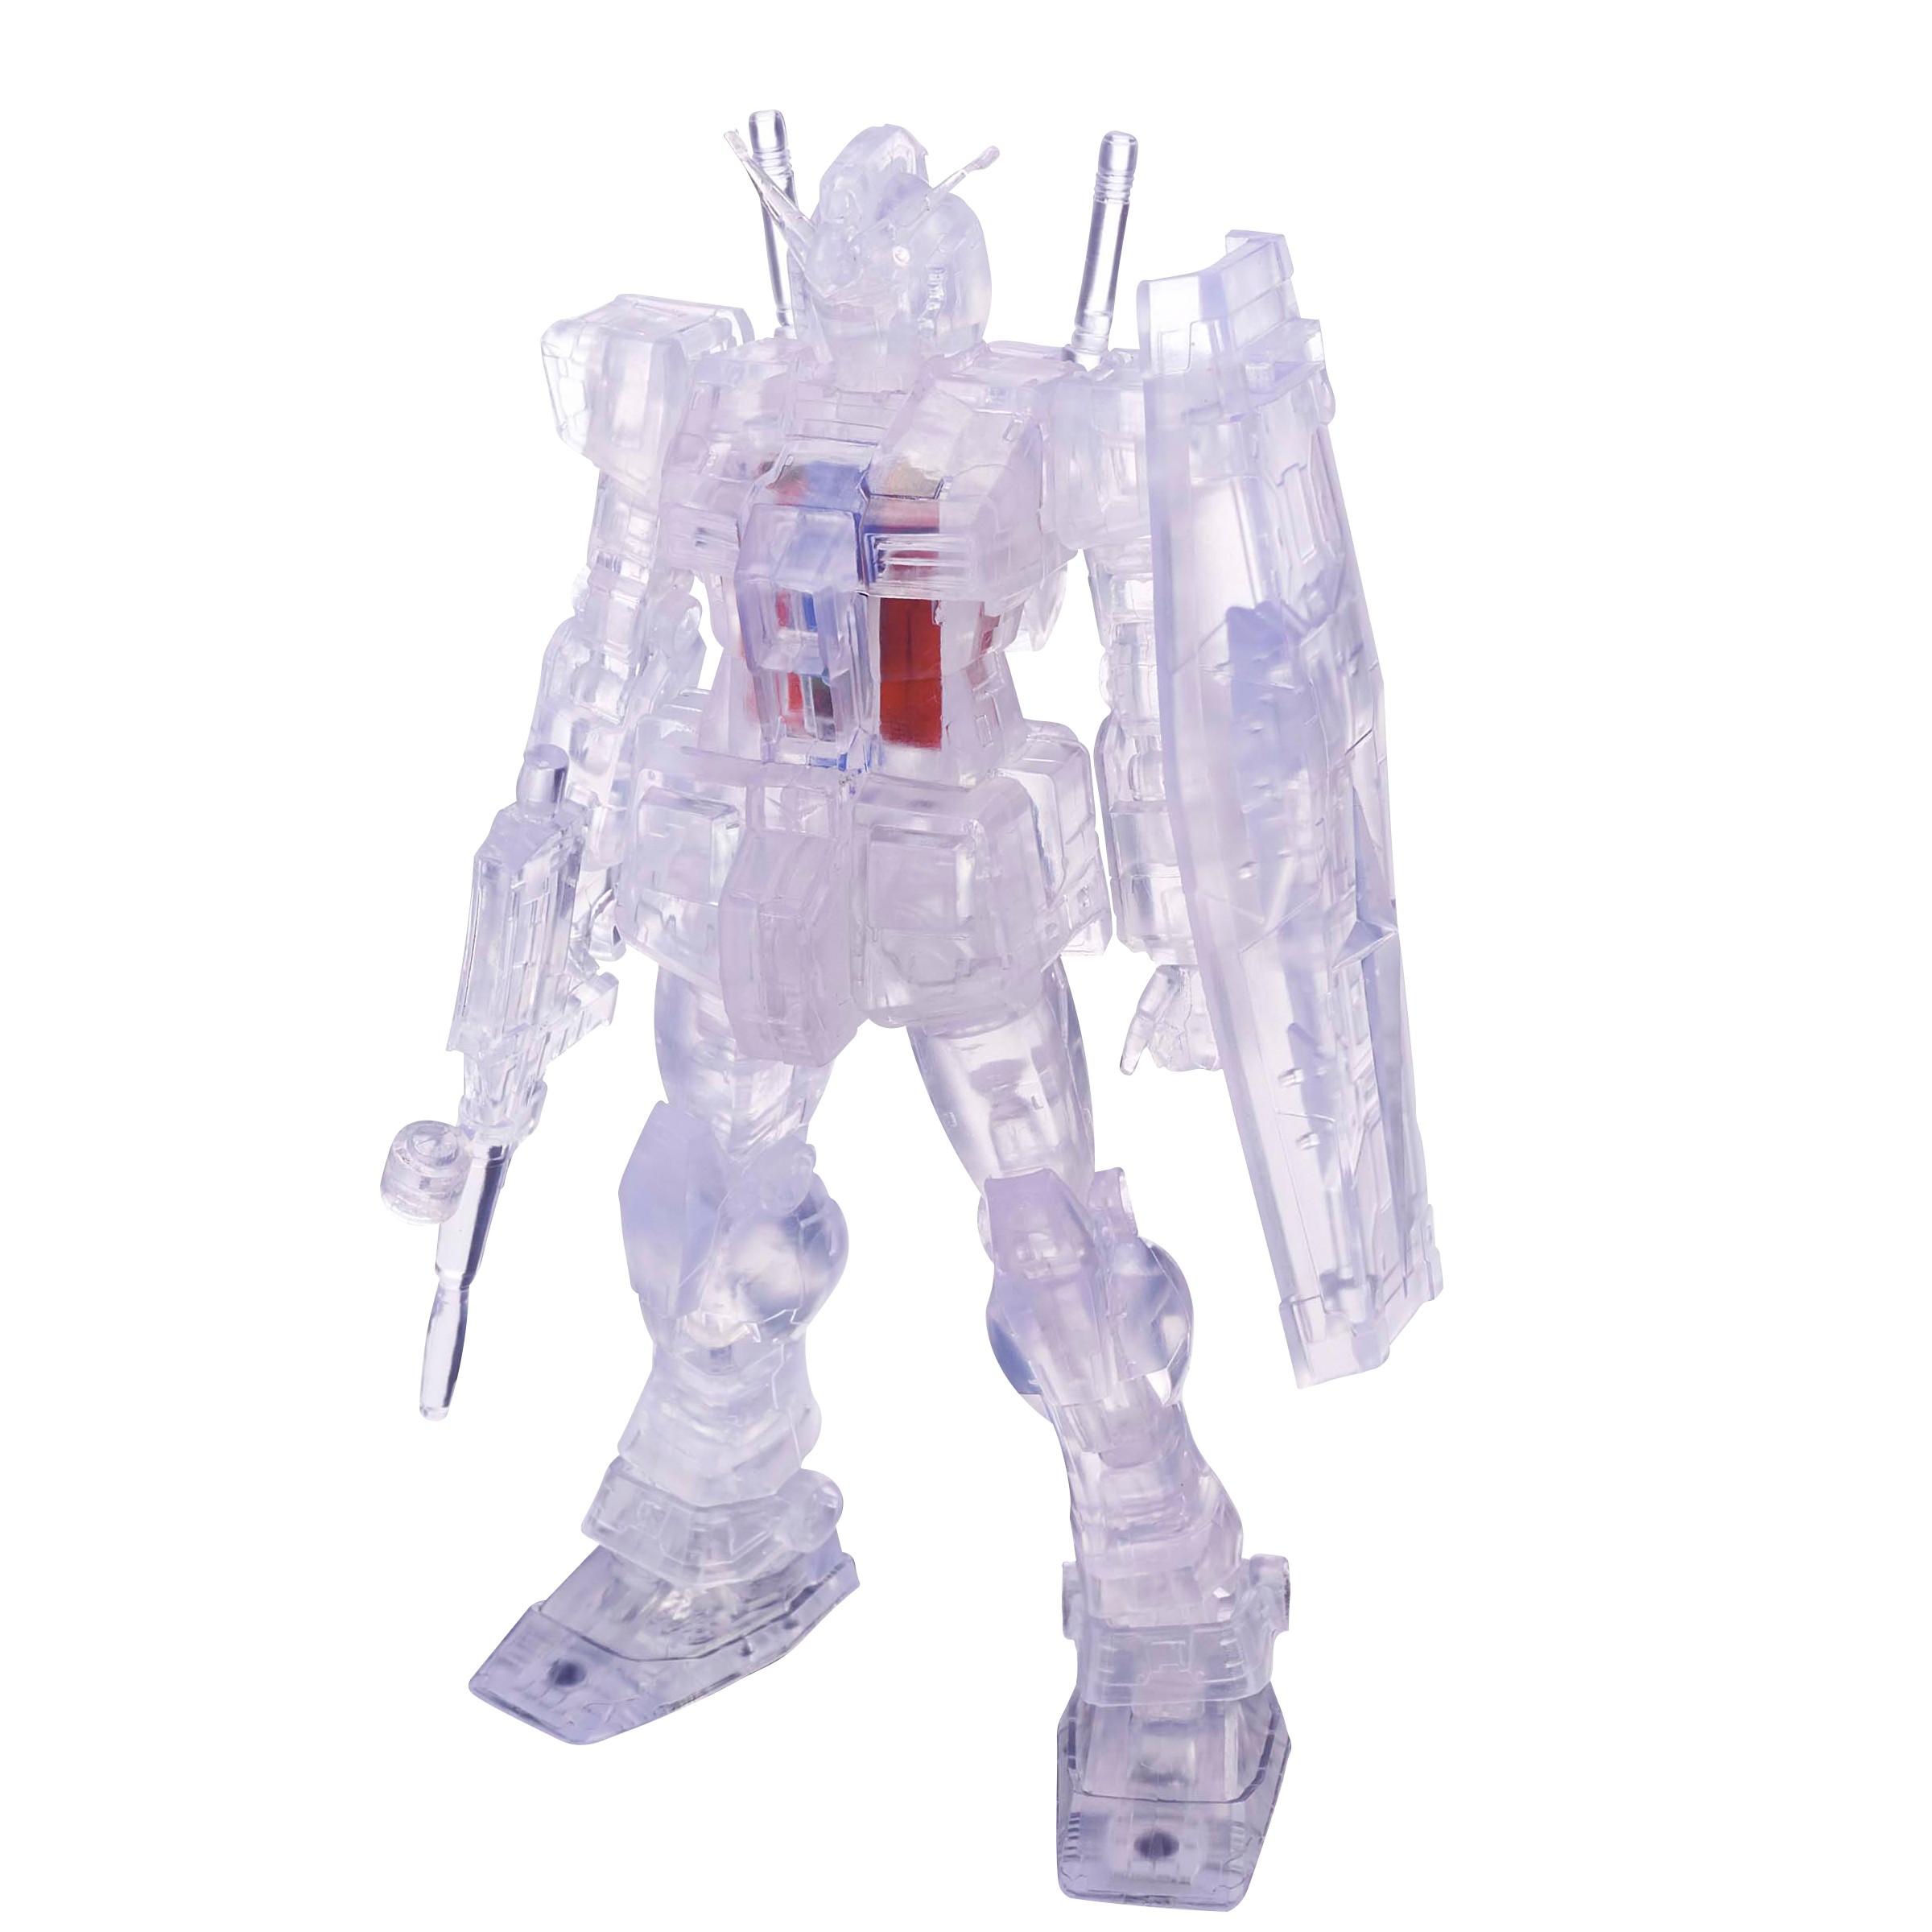 Mobile Suit Gundam Internal Structure RX-78-2 Gundam Weapon Figure (Ver.2)